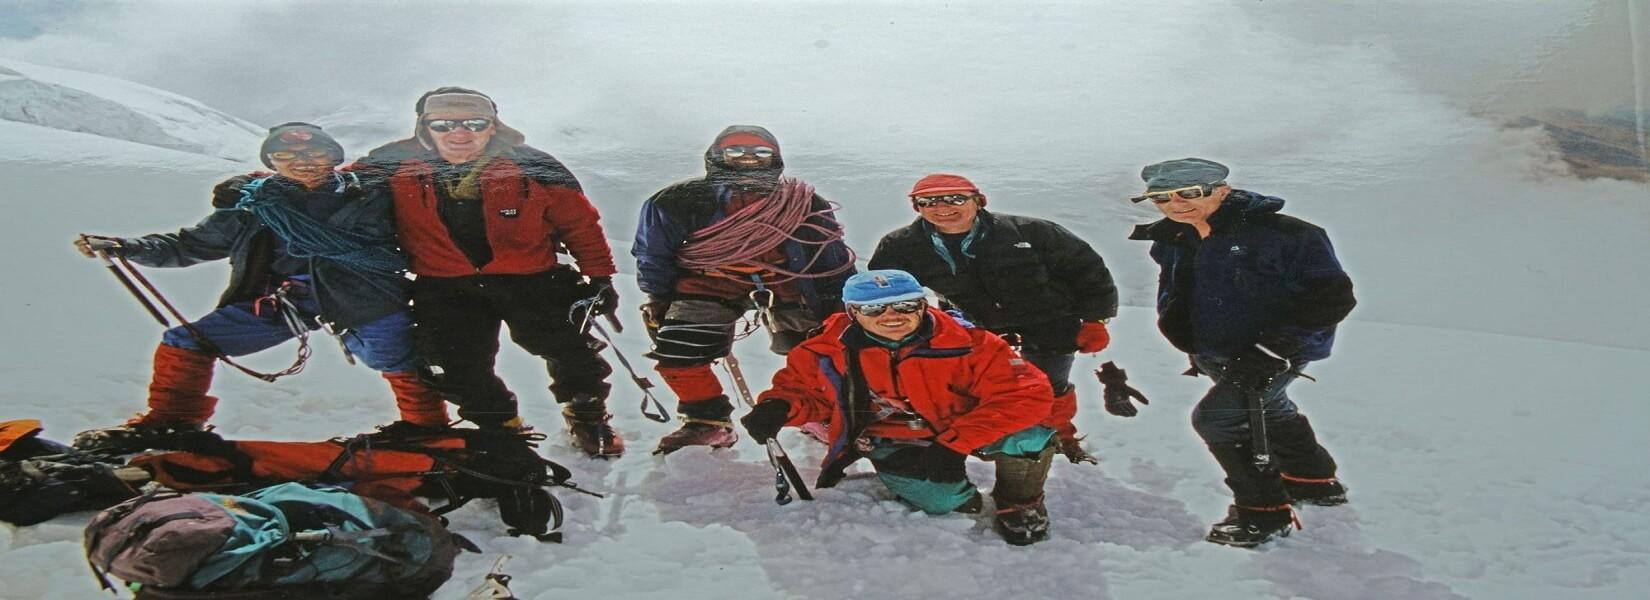 Chulu Far East Peak Trek